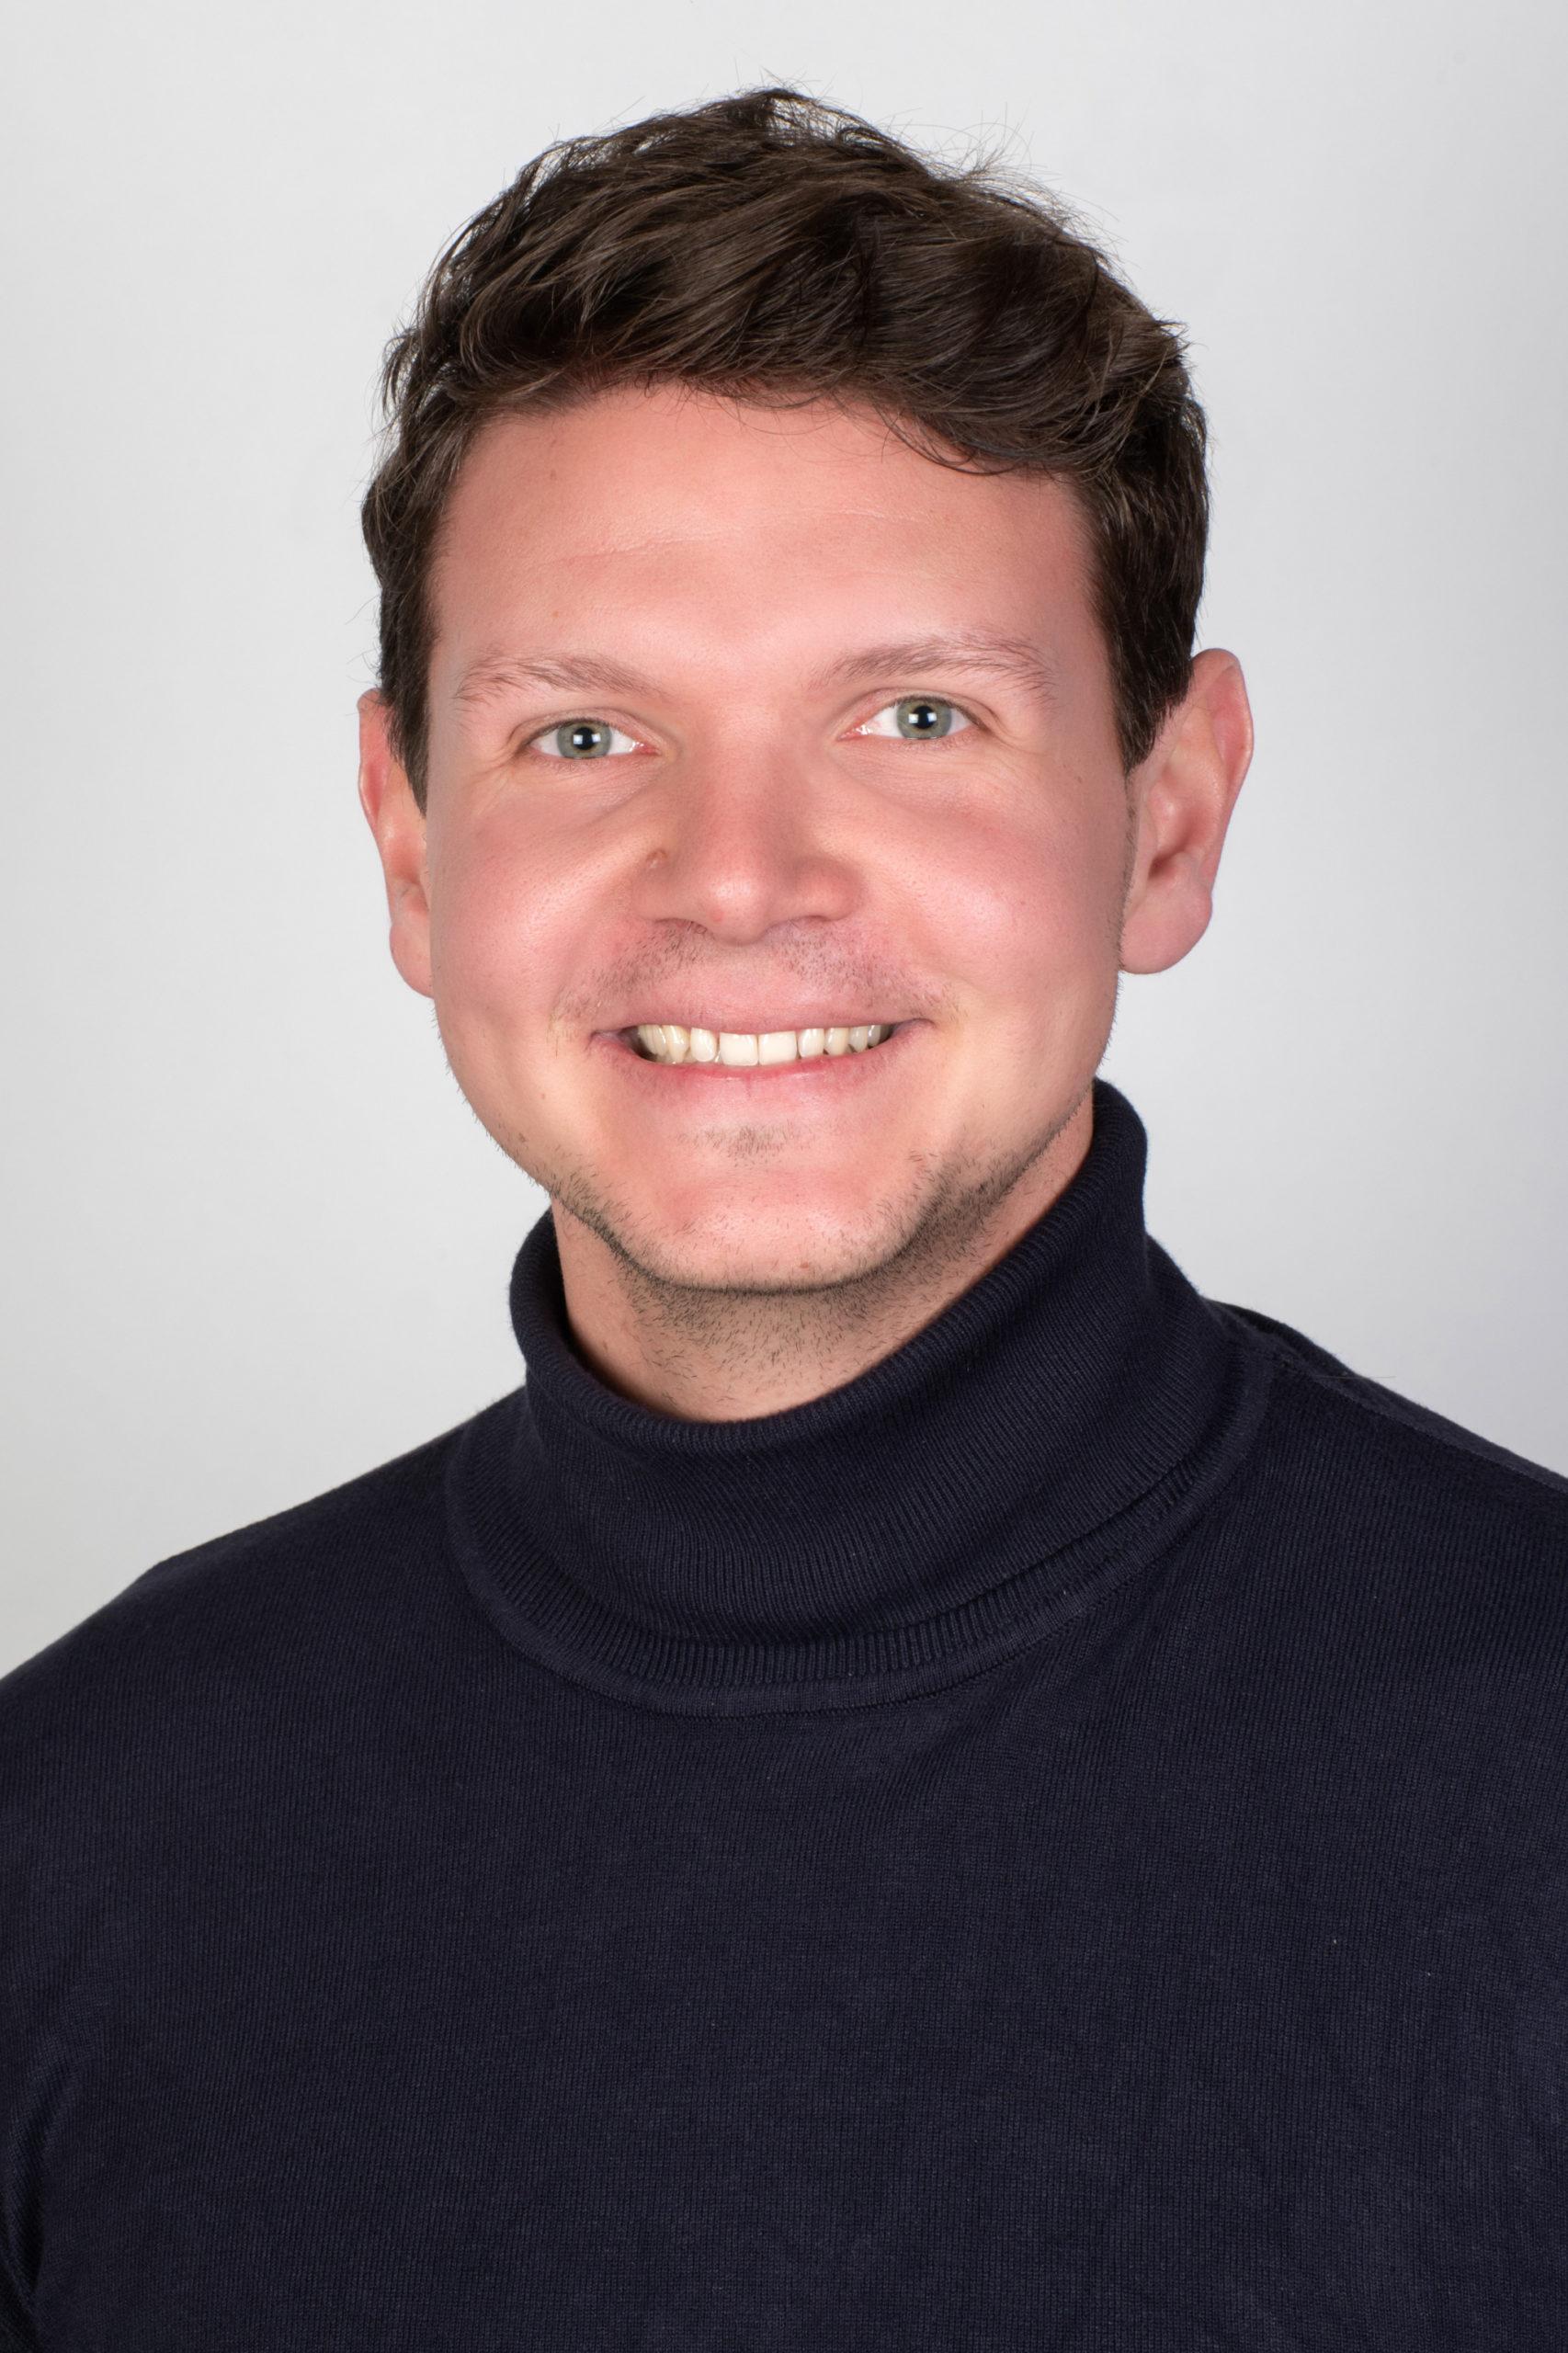 Johannes Basch Berater für Recruiting